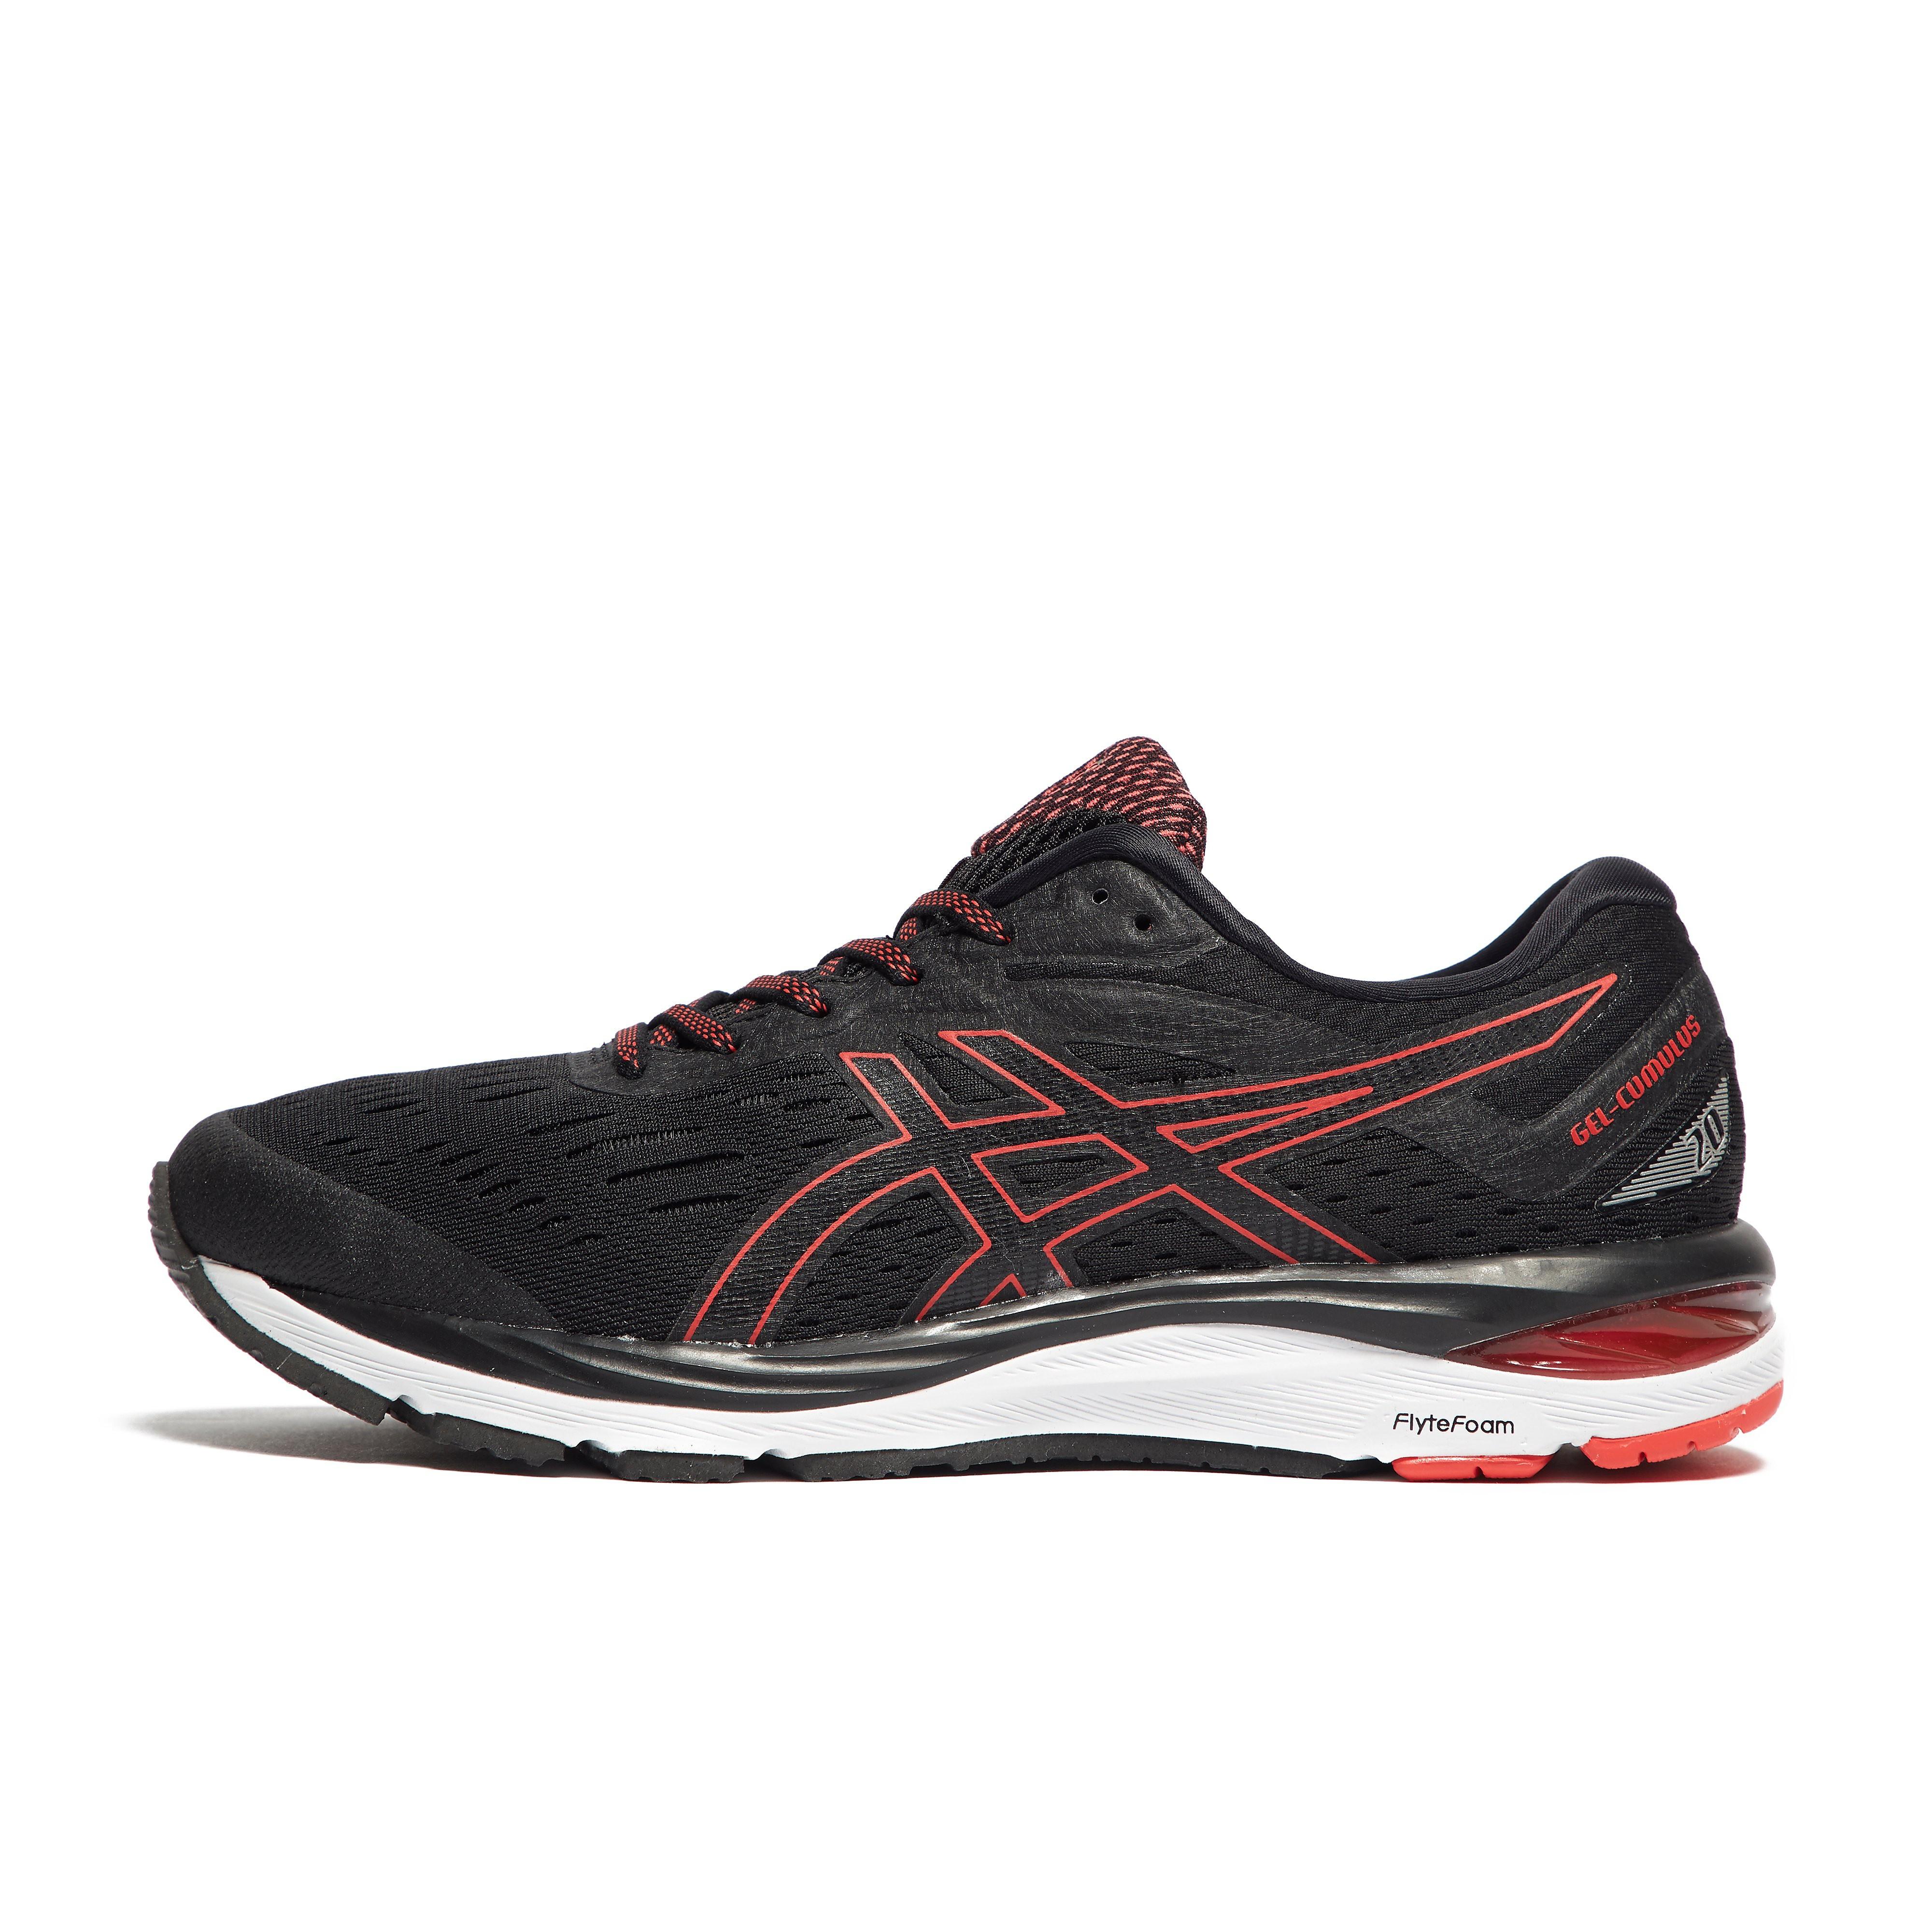 Mens Black ASICS Gel-Cumulus 20 Running Shoes